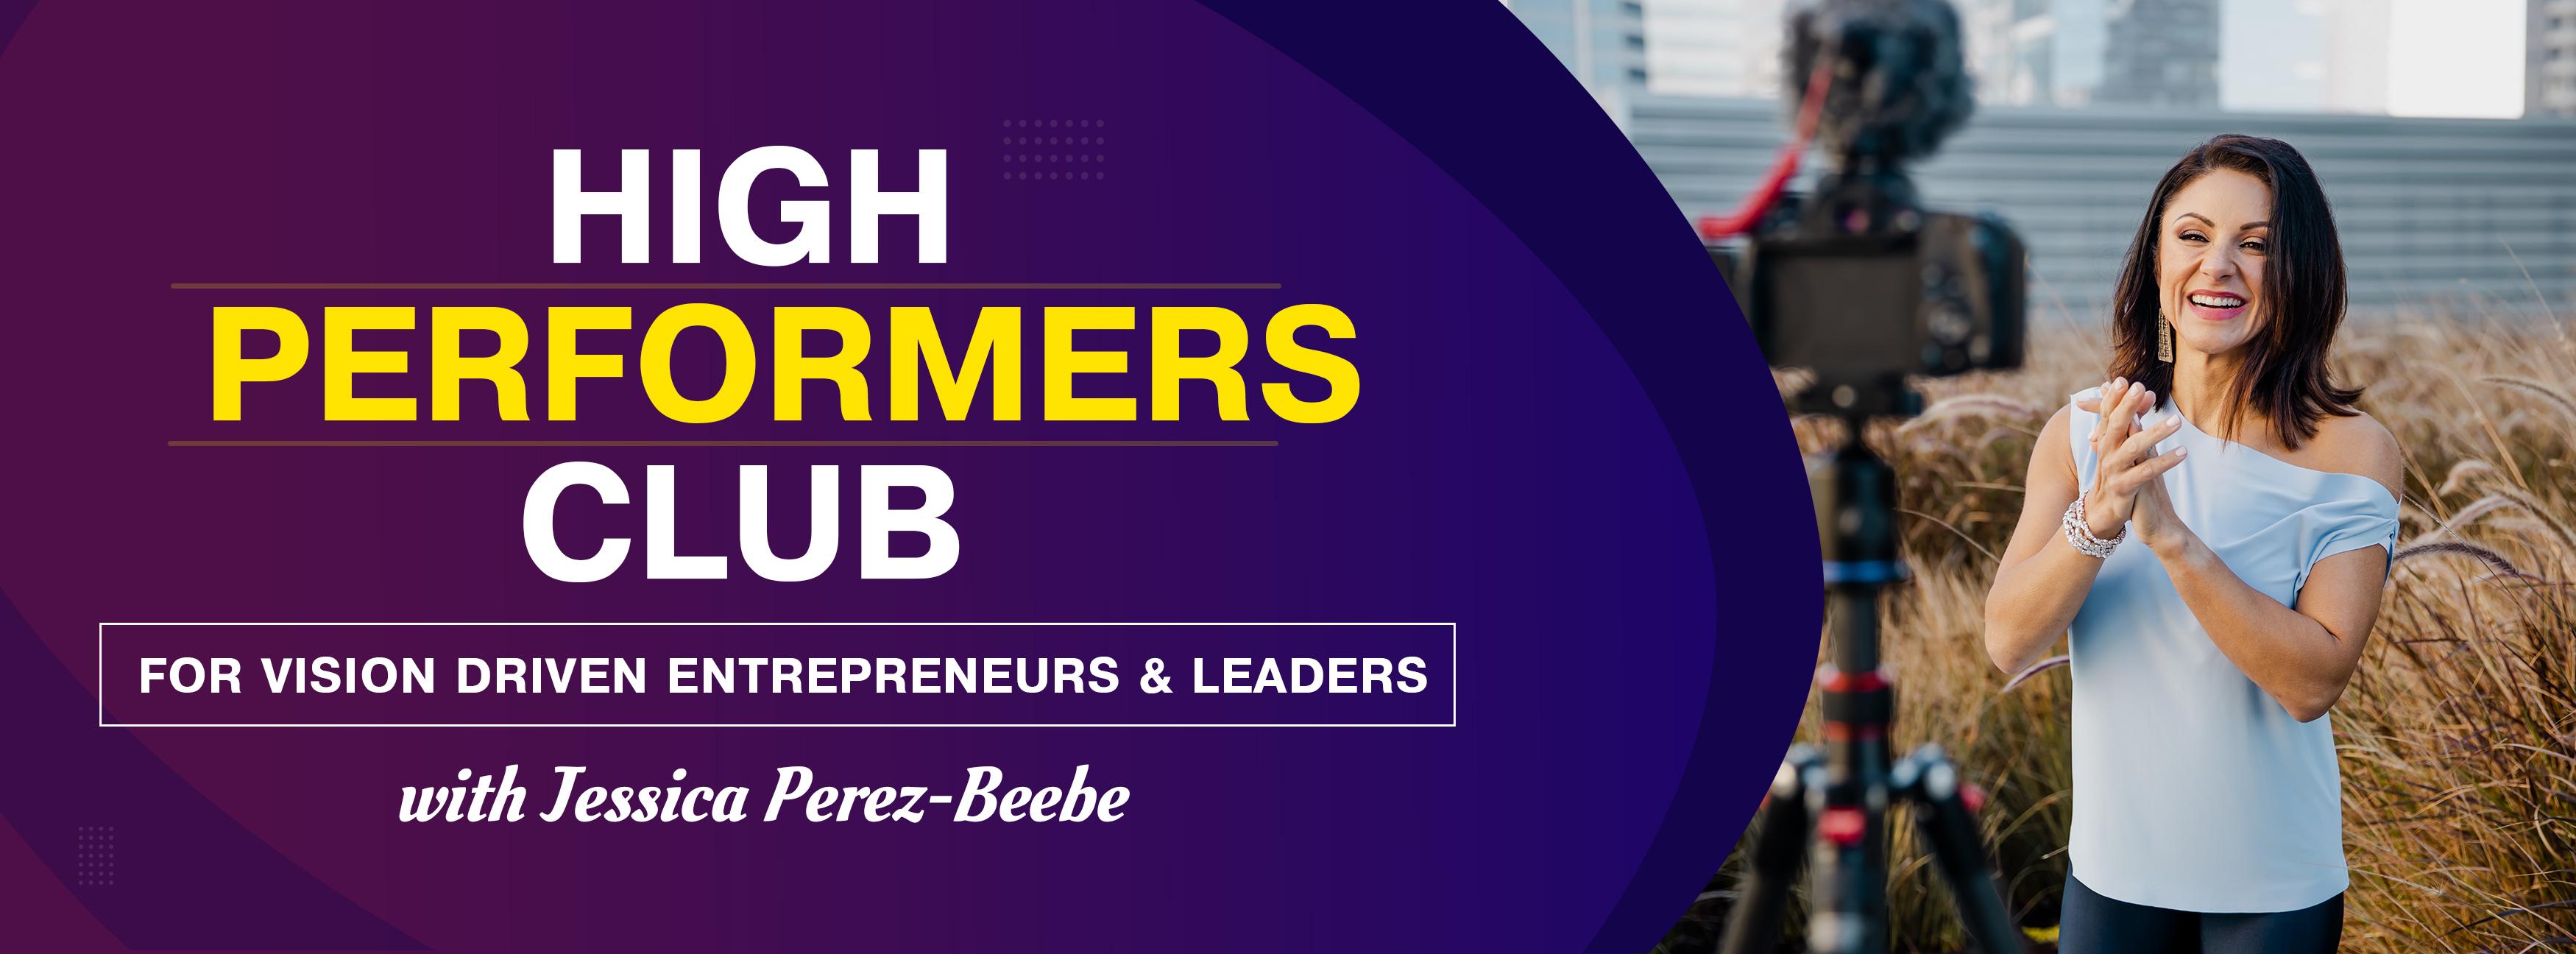 Deposit for High Performers Club (HPC)